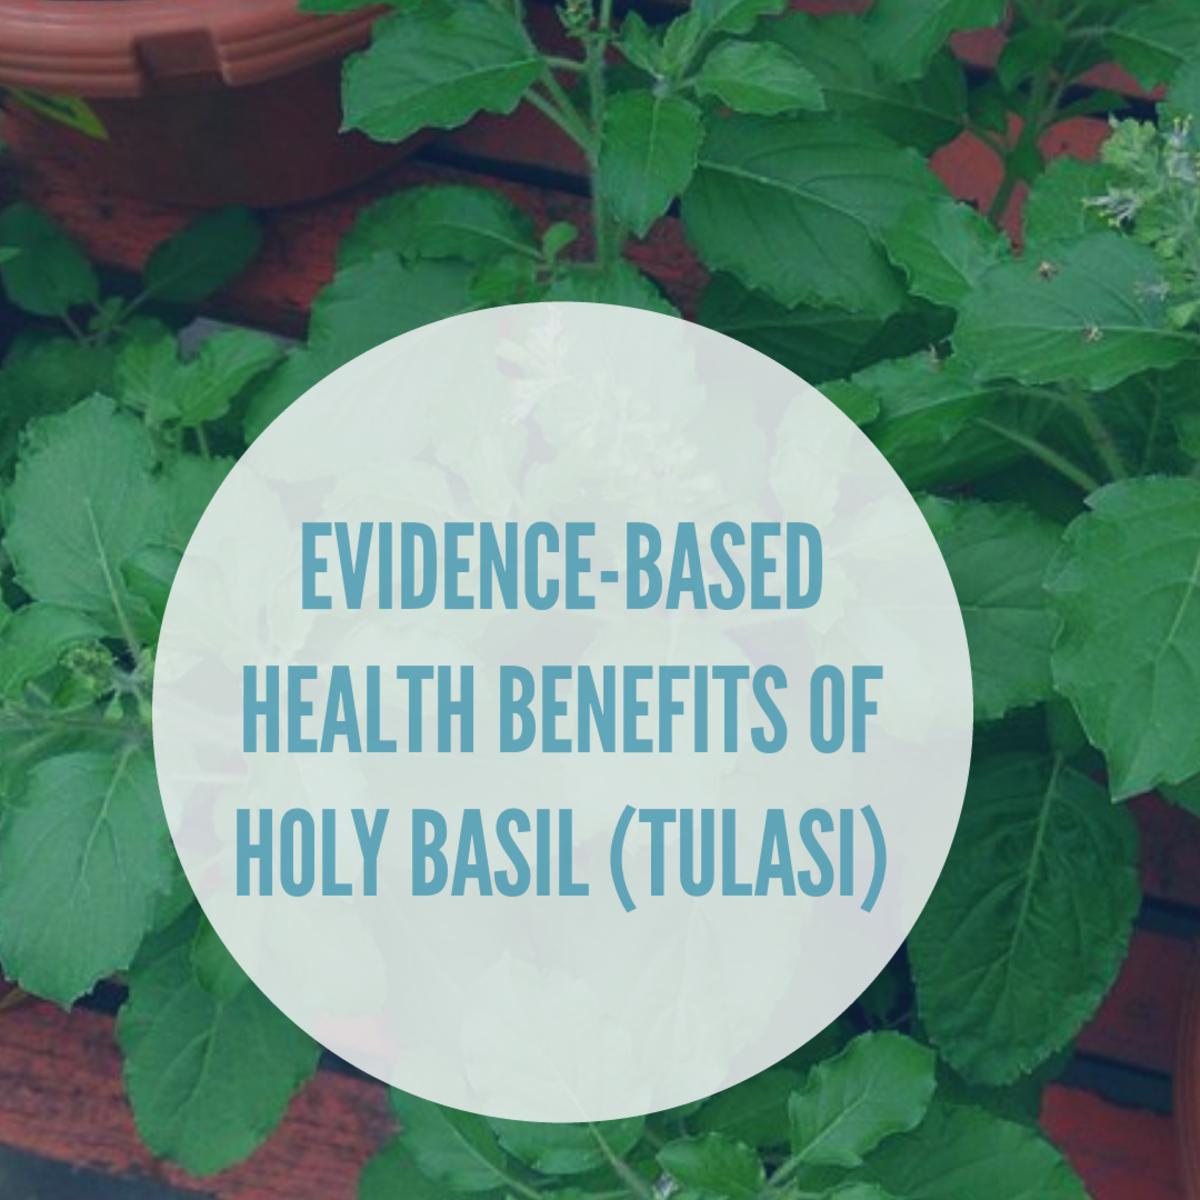 16 Evidence-Based Health Benefits of Holy Basil or Tulasi